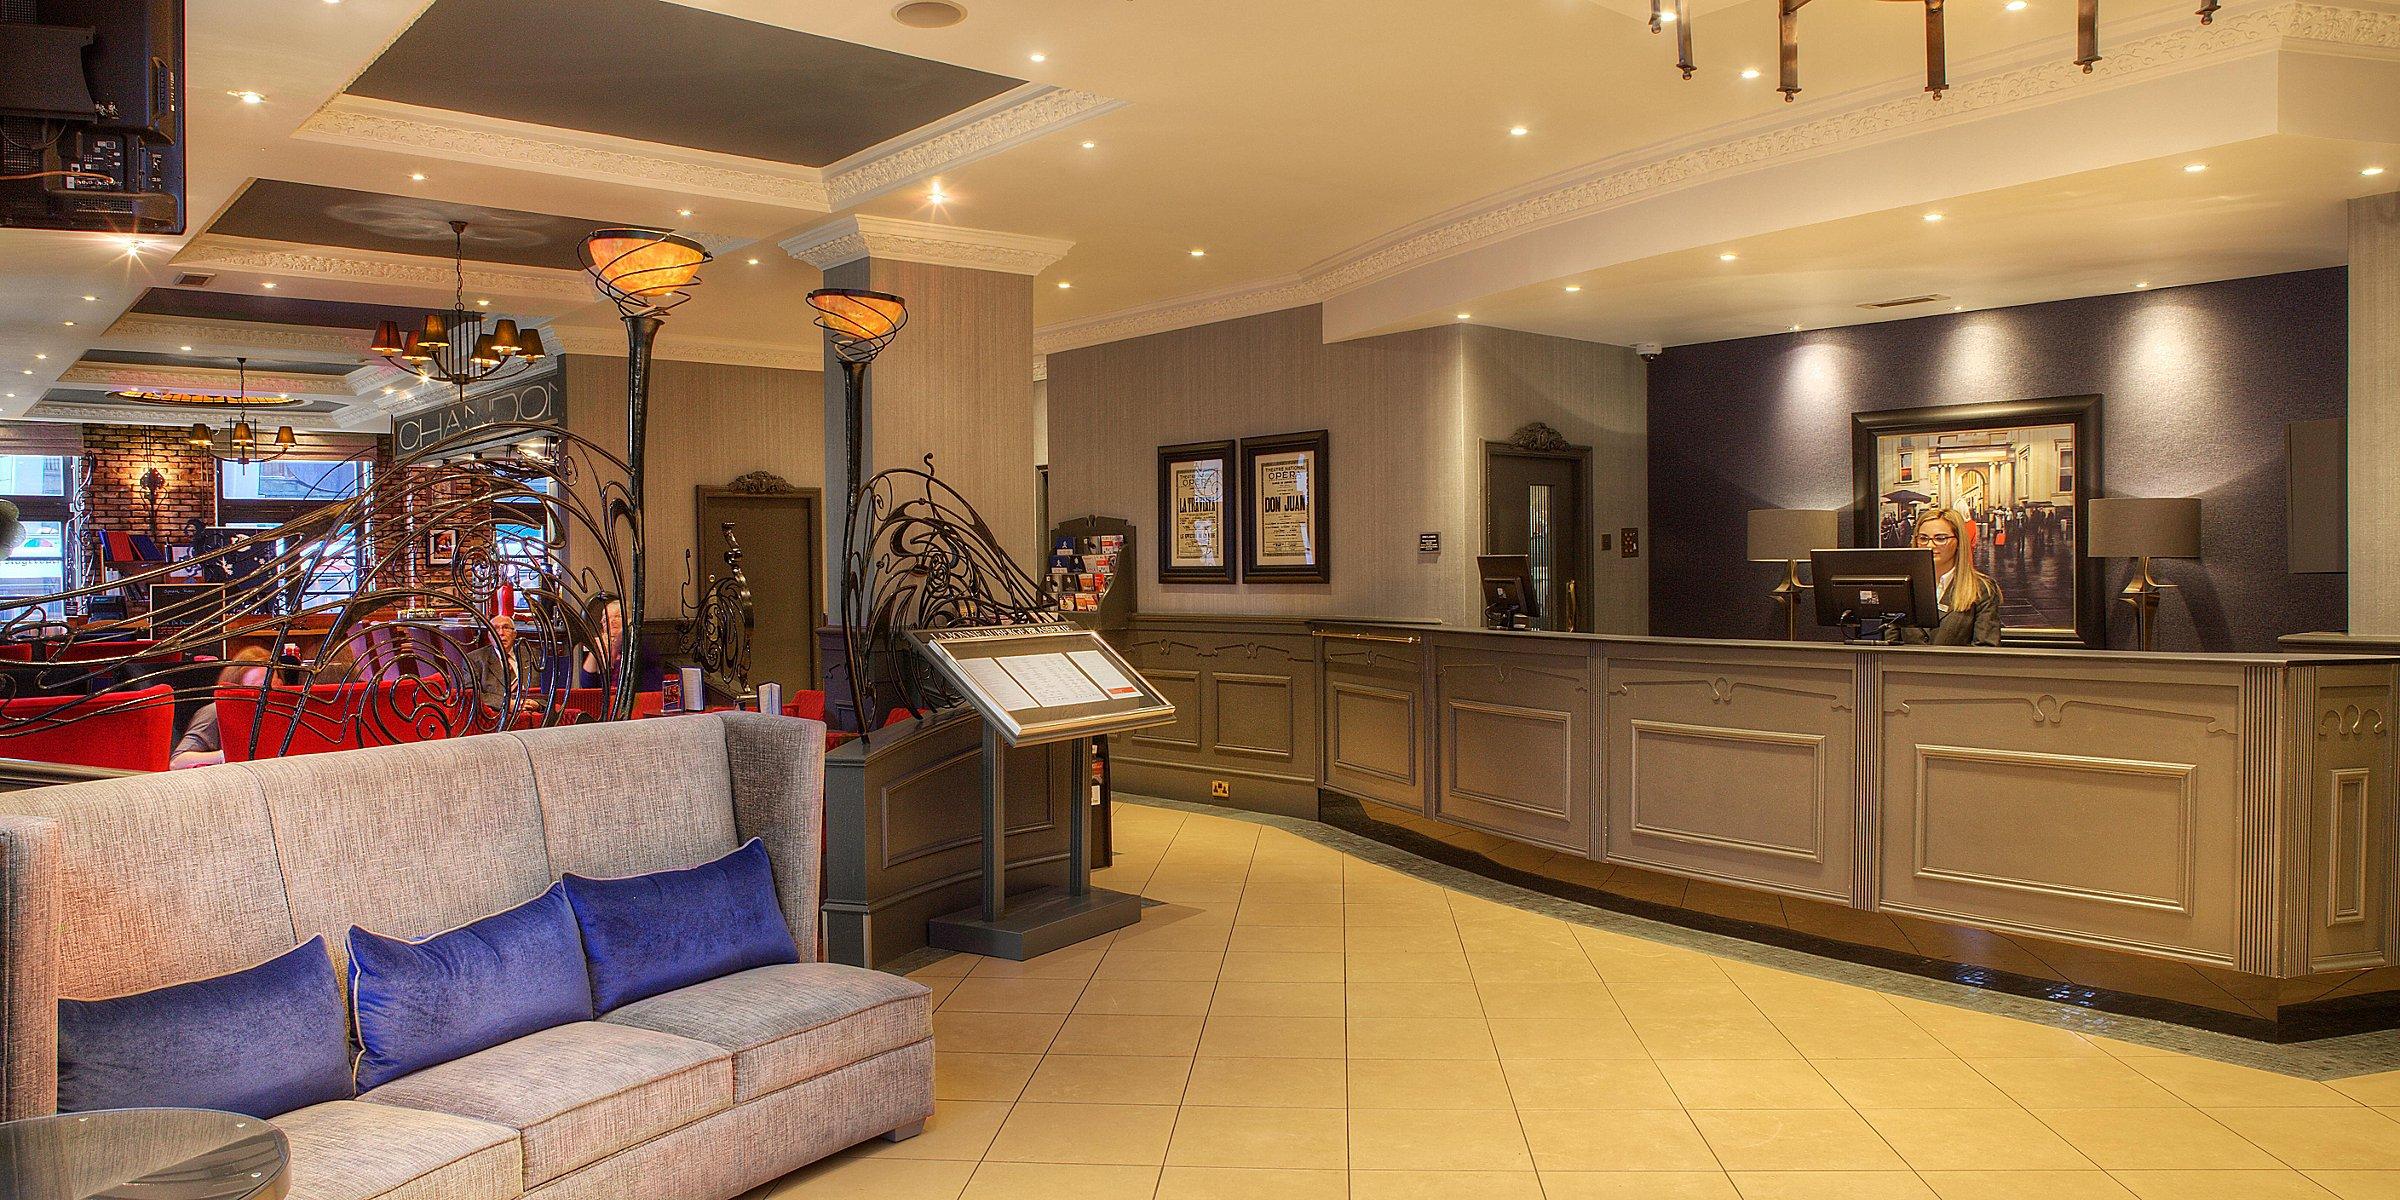 Holiday Inn Hotel Glasgow City Centre Theatreland